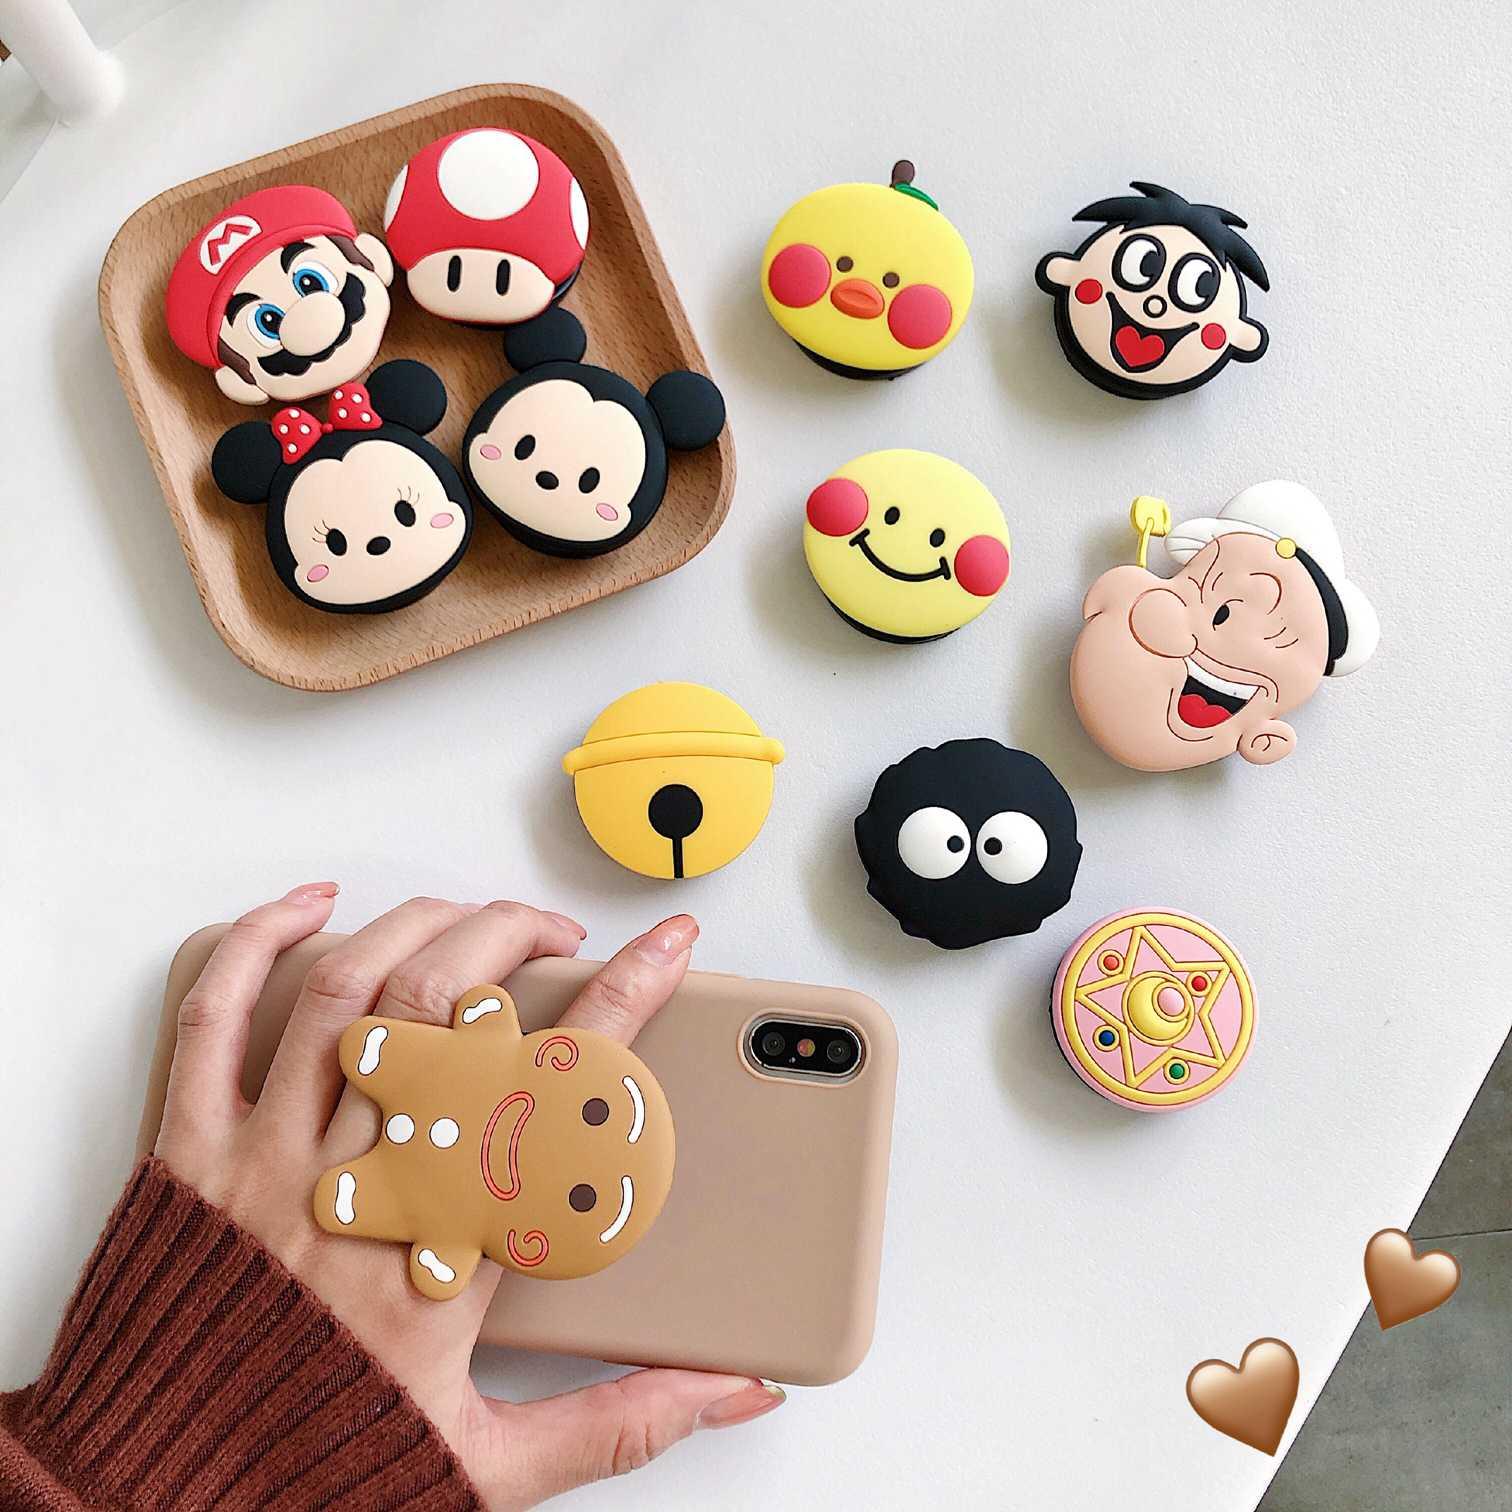 Lovely Cartoon Universal Phone Holder / Mobile Phone Grip Expanding Holder Phone Stand/Newed Cute Pattern Telescopic Finger Ring